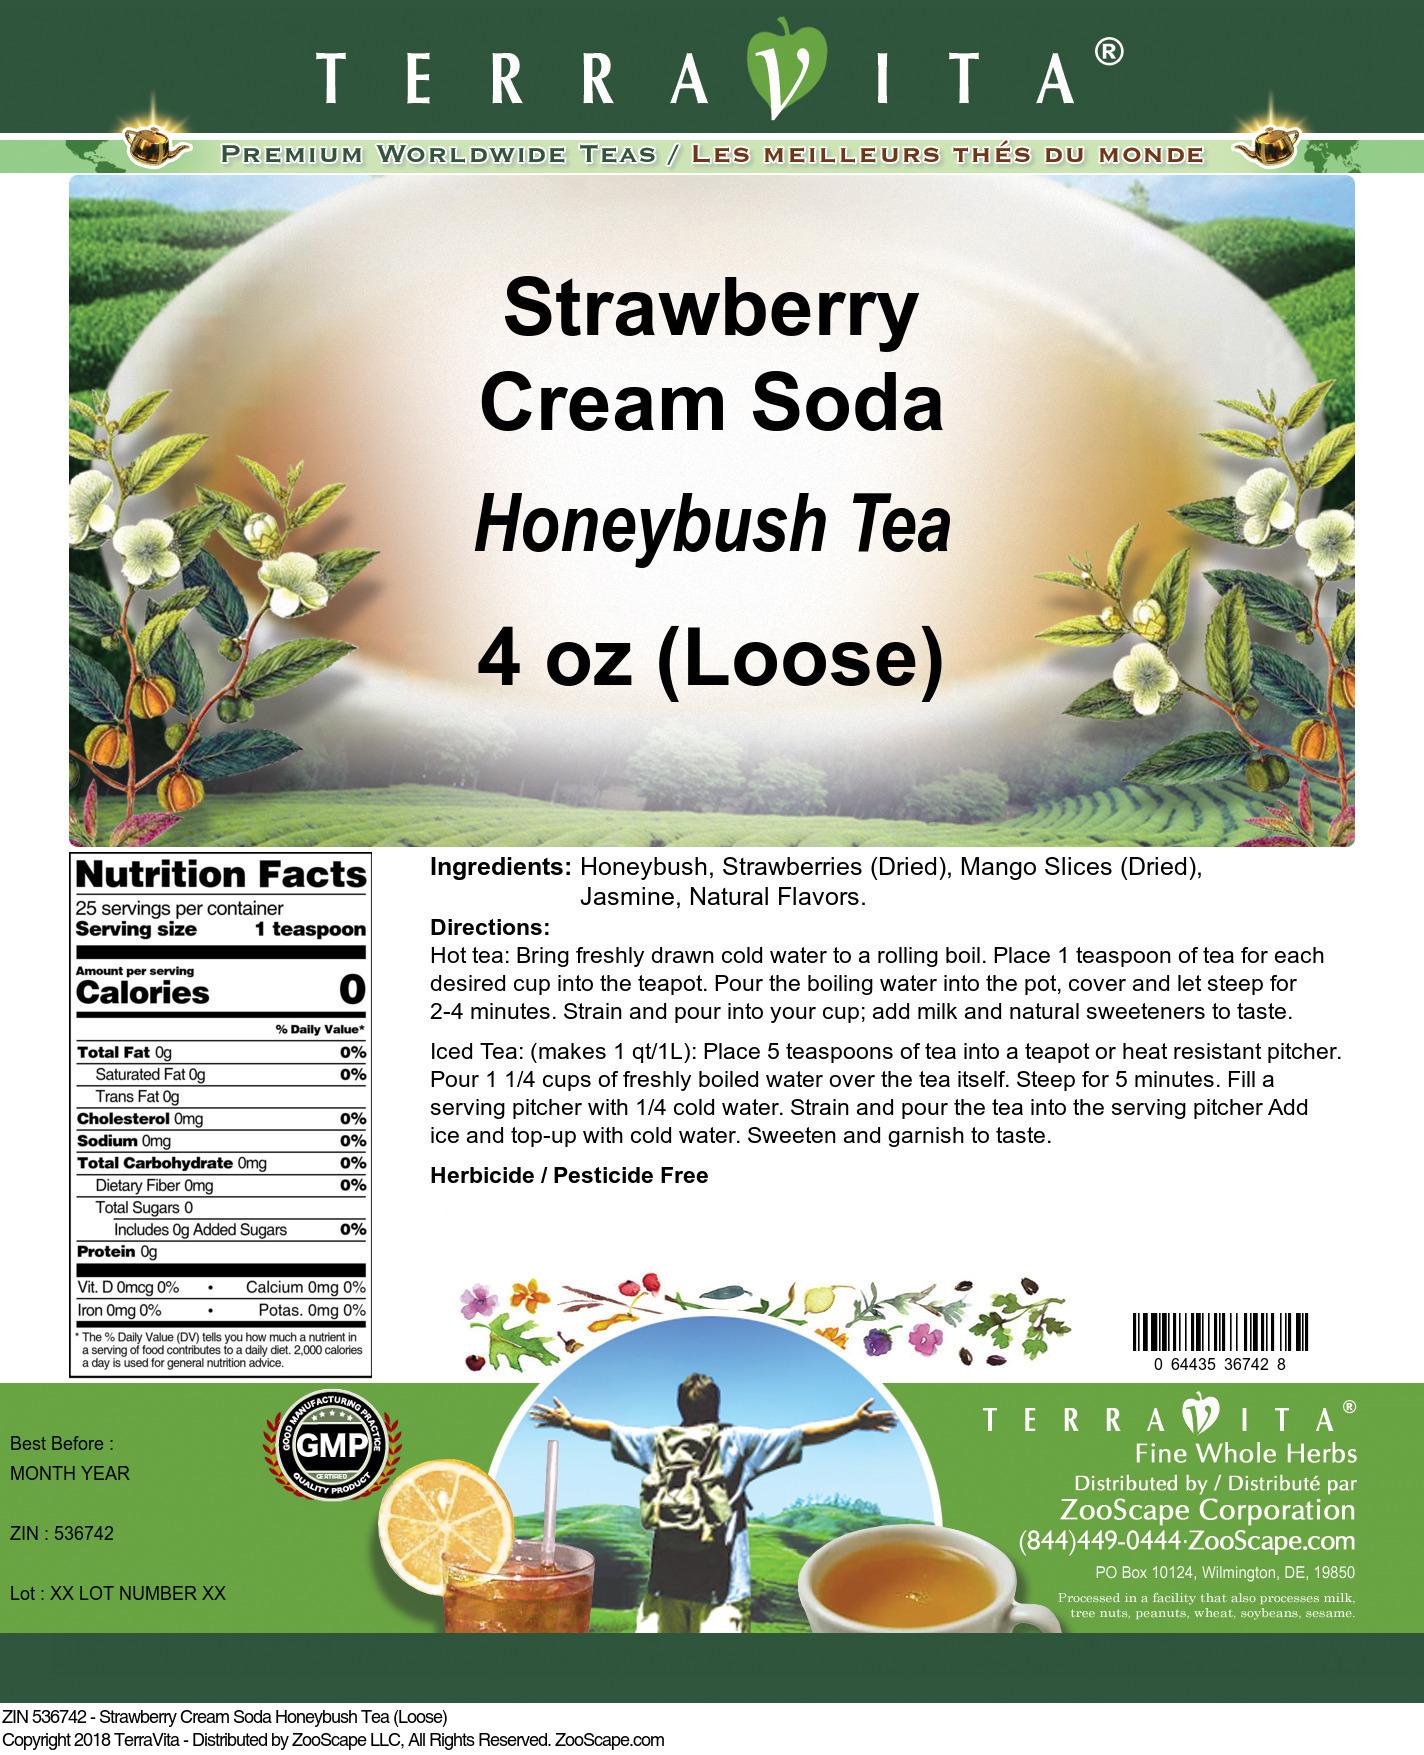 Strawberry Cream Soda Honeybush Tea